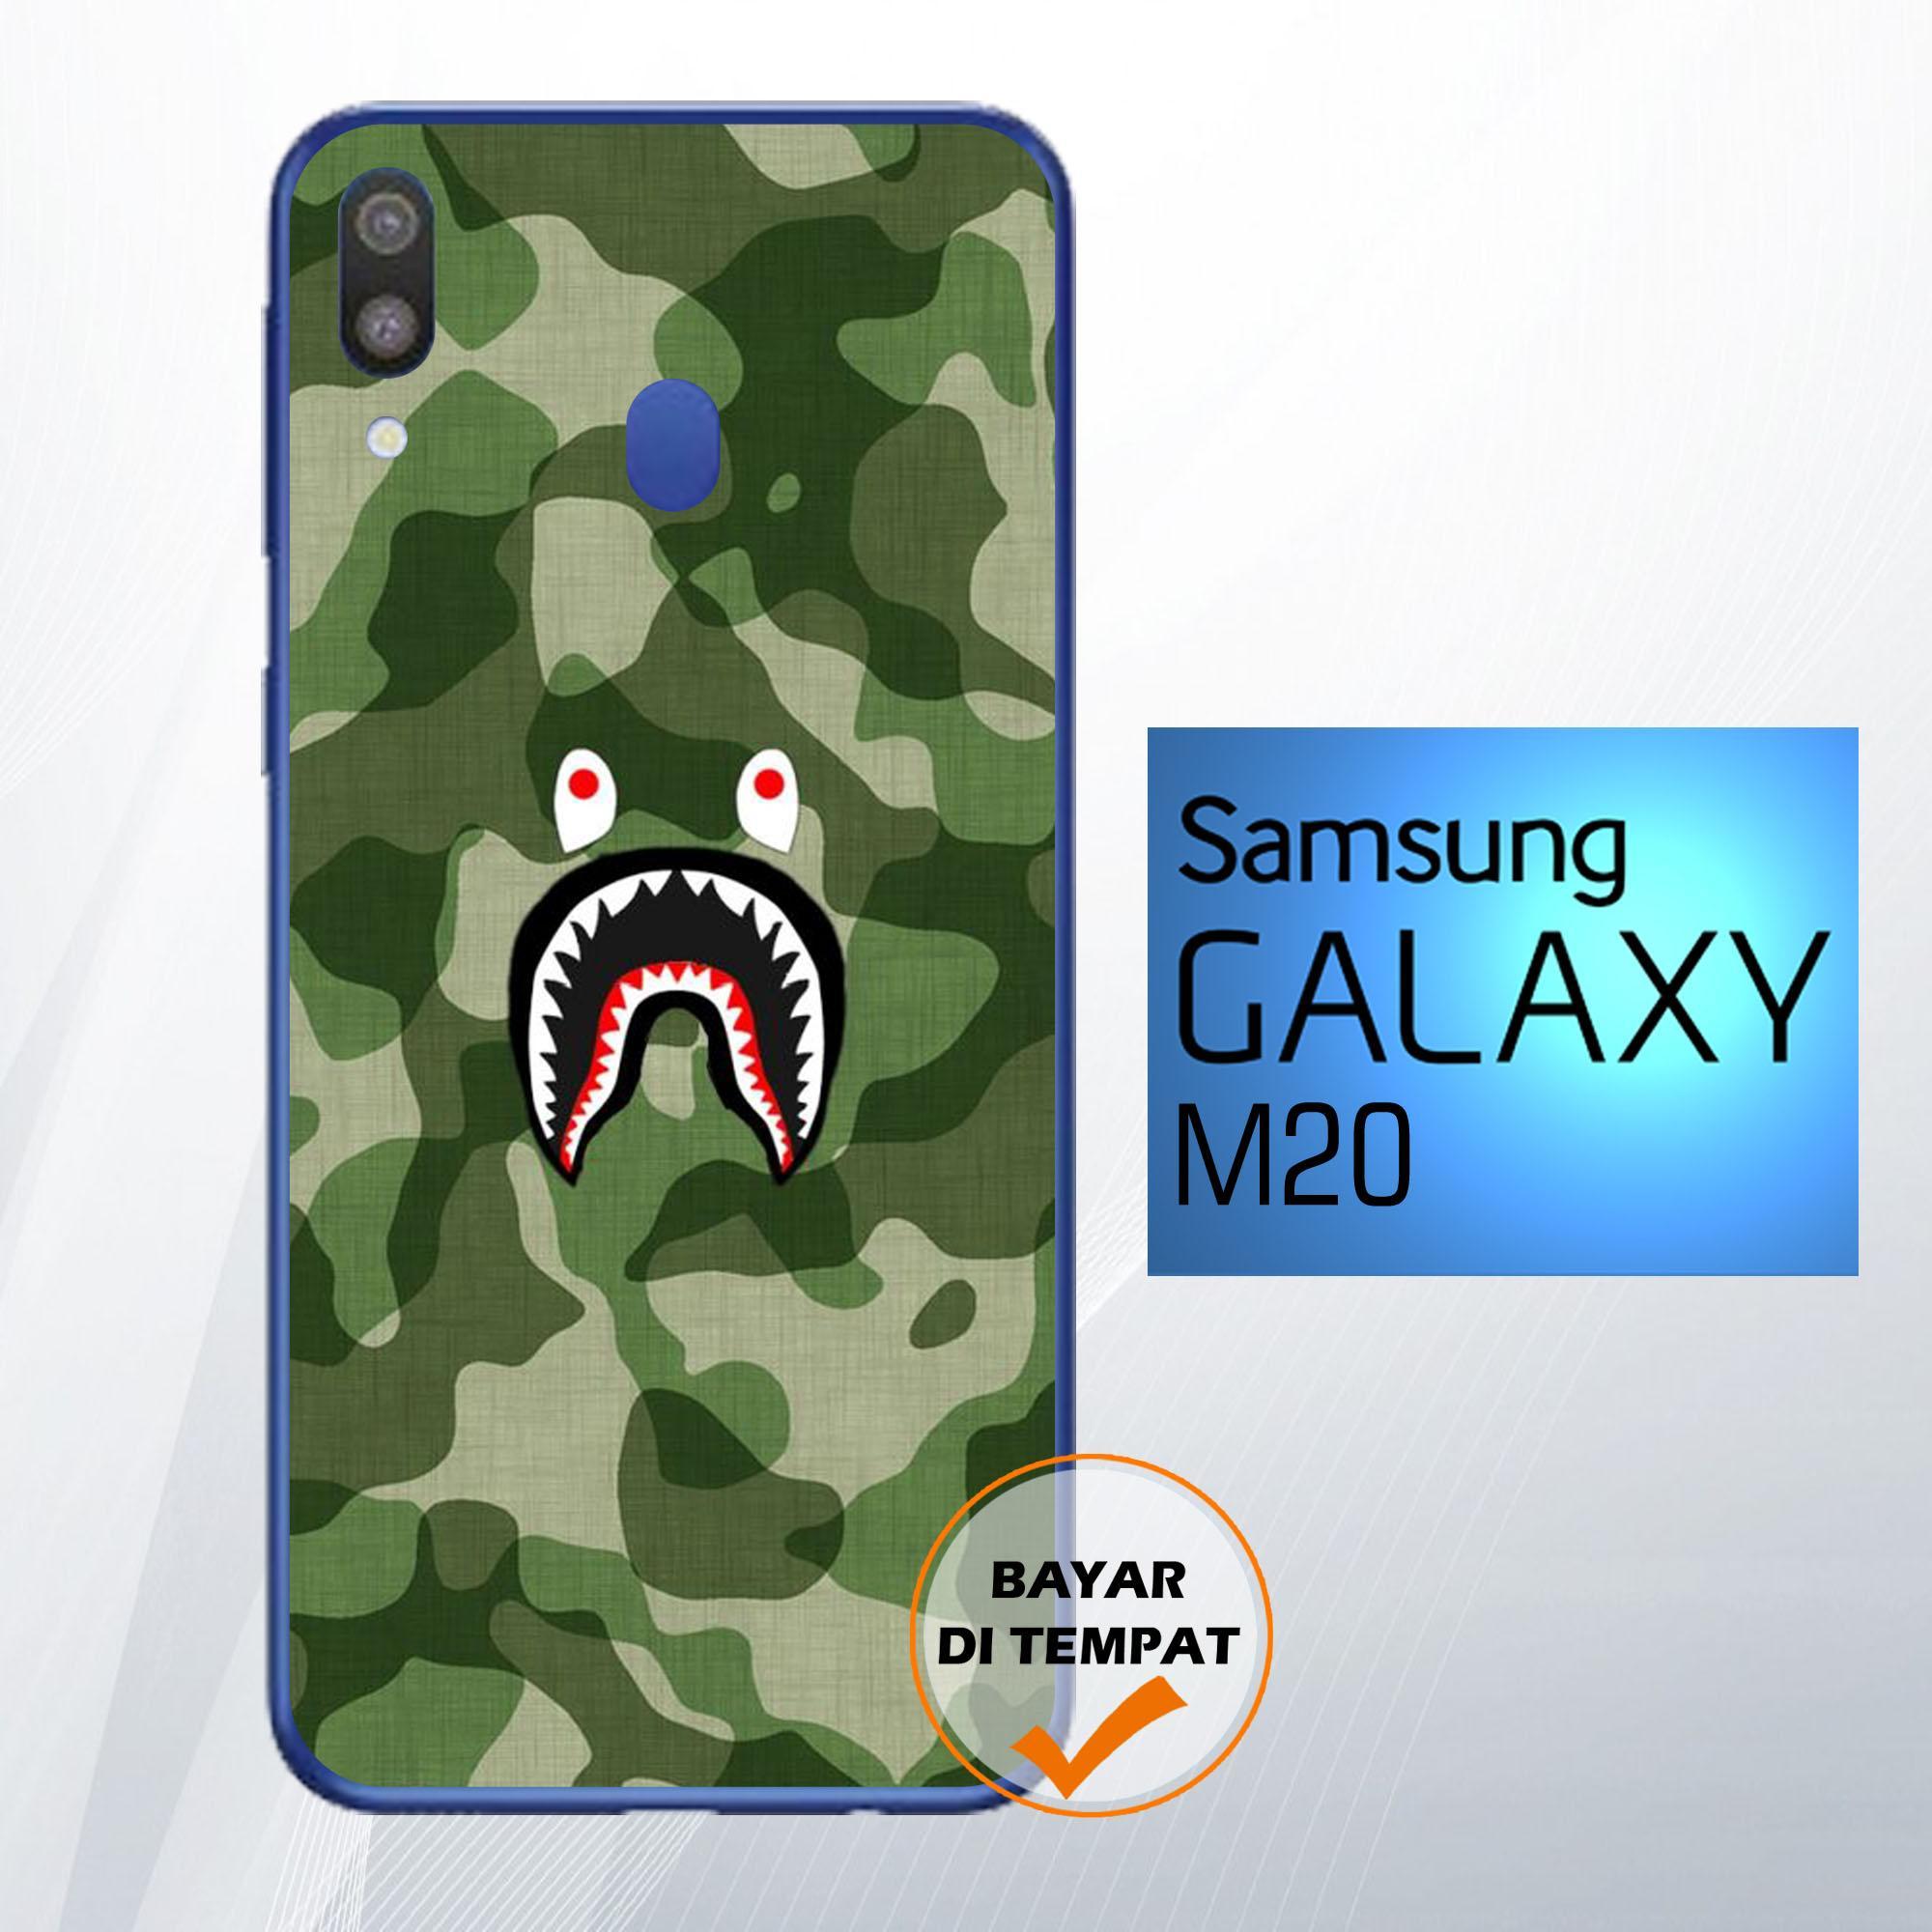 Case Samsung Galaxy M20 20-51-Hardcase-Softcase-Fullprint-Aksesori hp-Pelindung hp-Kondom hp